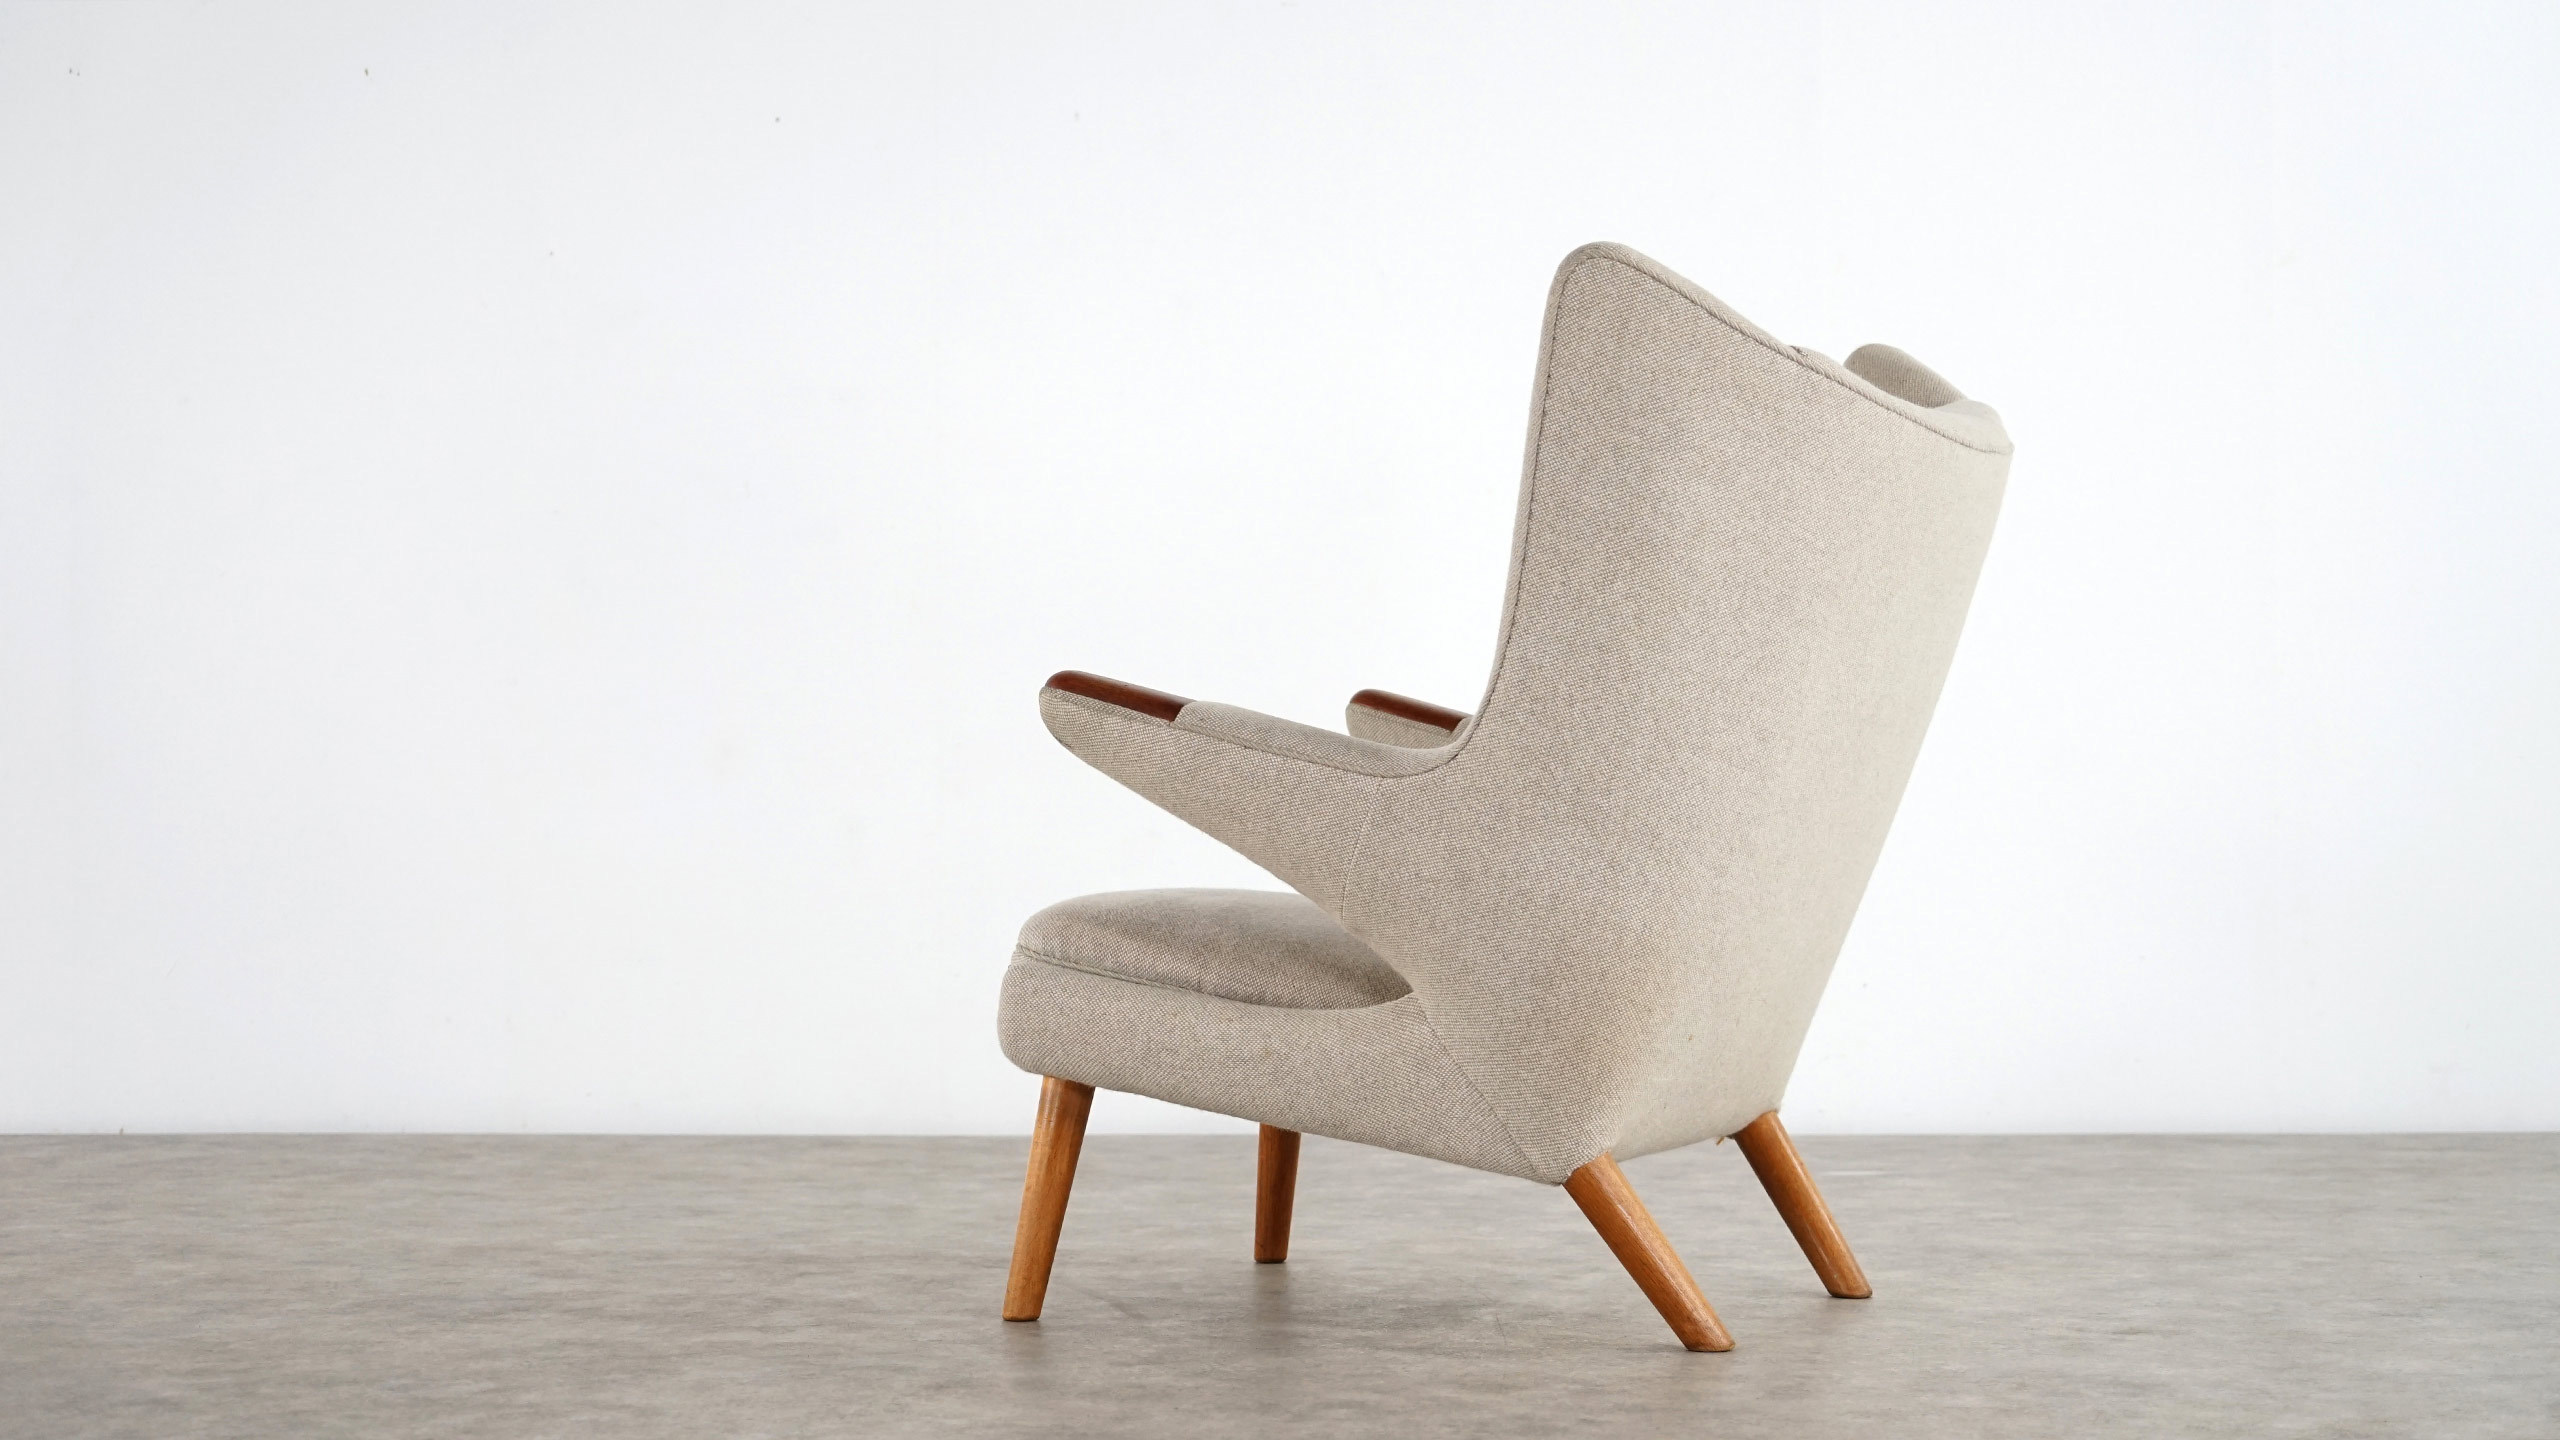 hans j wegner papa bear lounge chair ap stolen sessel. Black Bedroom Furniture Sets. Home Design Ideas